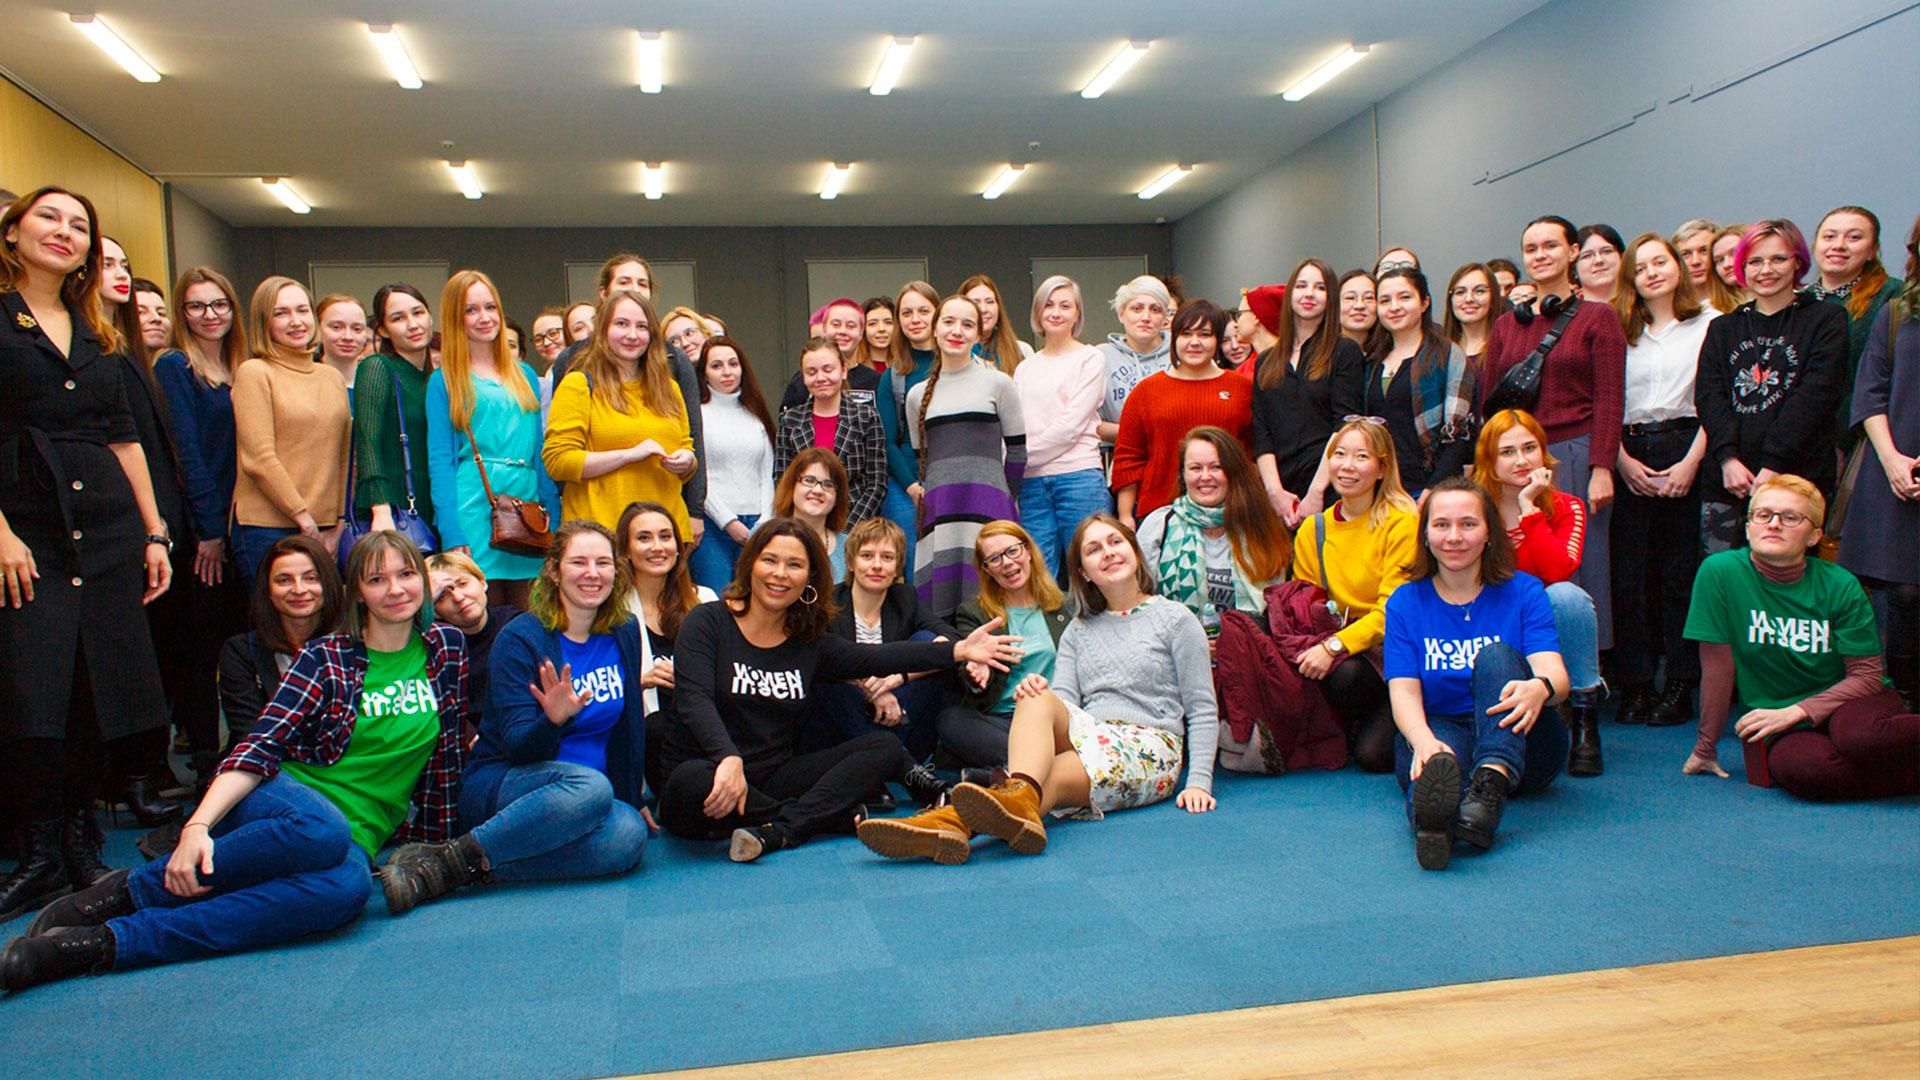 Women in Tech Russia Chapter launch | Saint-Petersburg, 12 December 2020